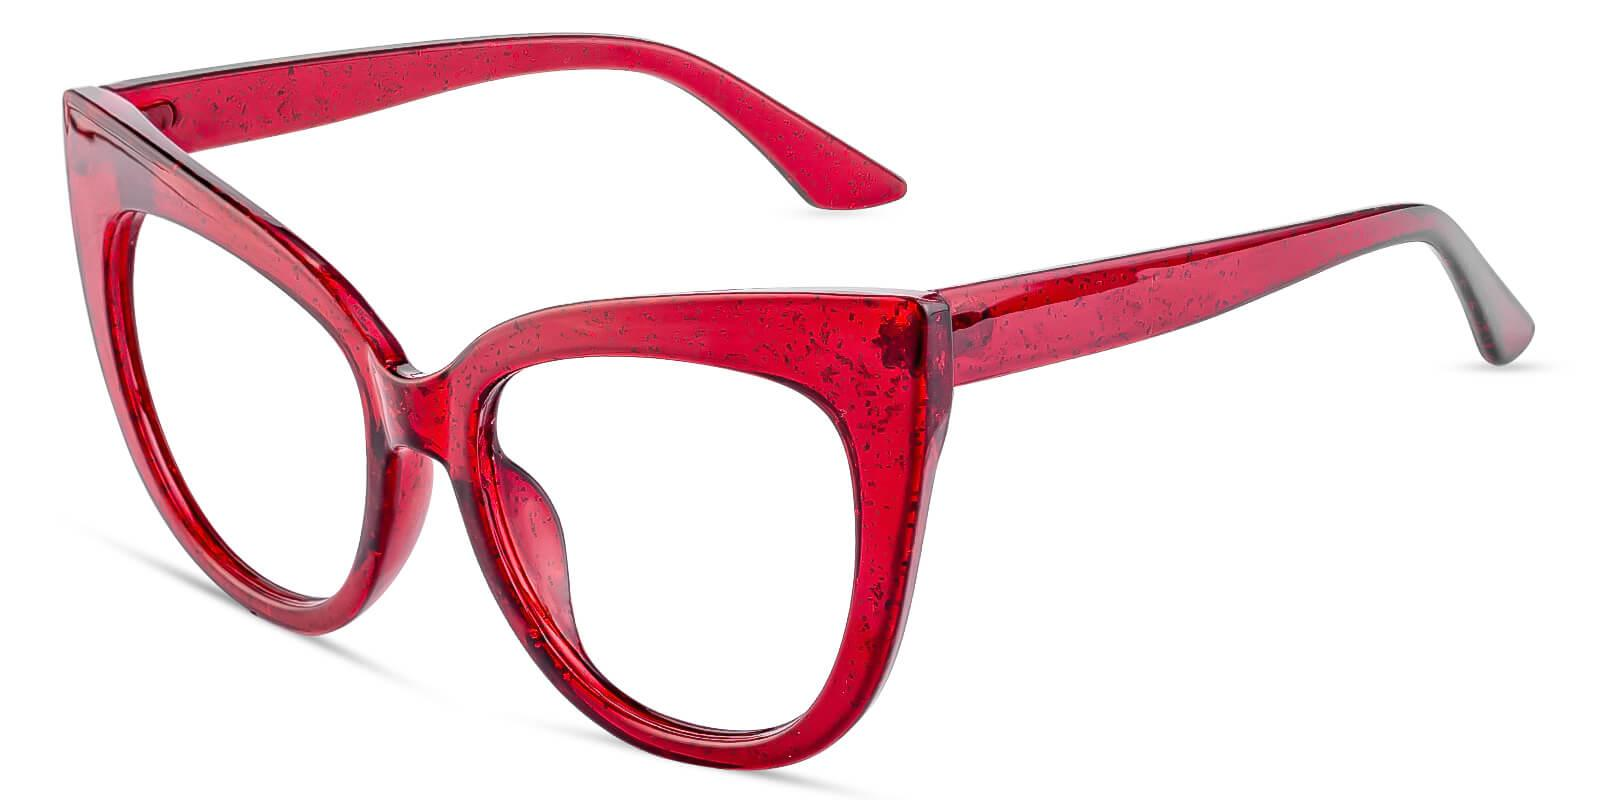 Cassian Red Plastic Eyeglasses , Fashion , UniversalBridgeFit Frames from ABBE Glasses